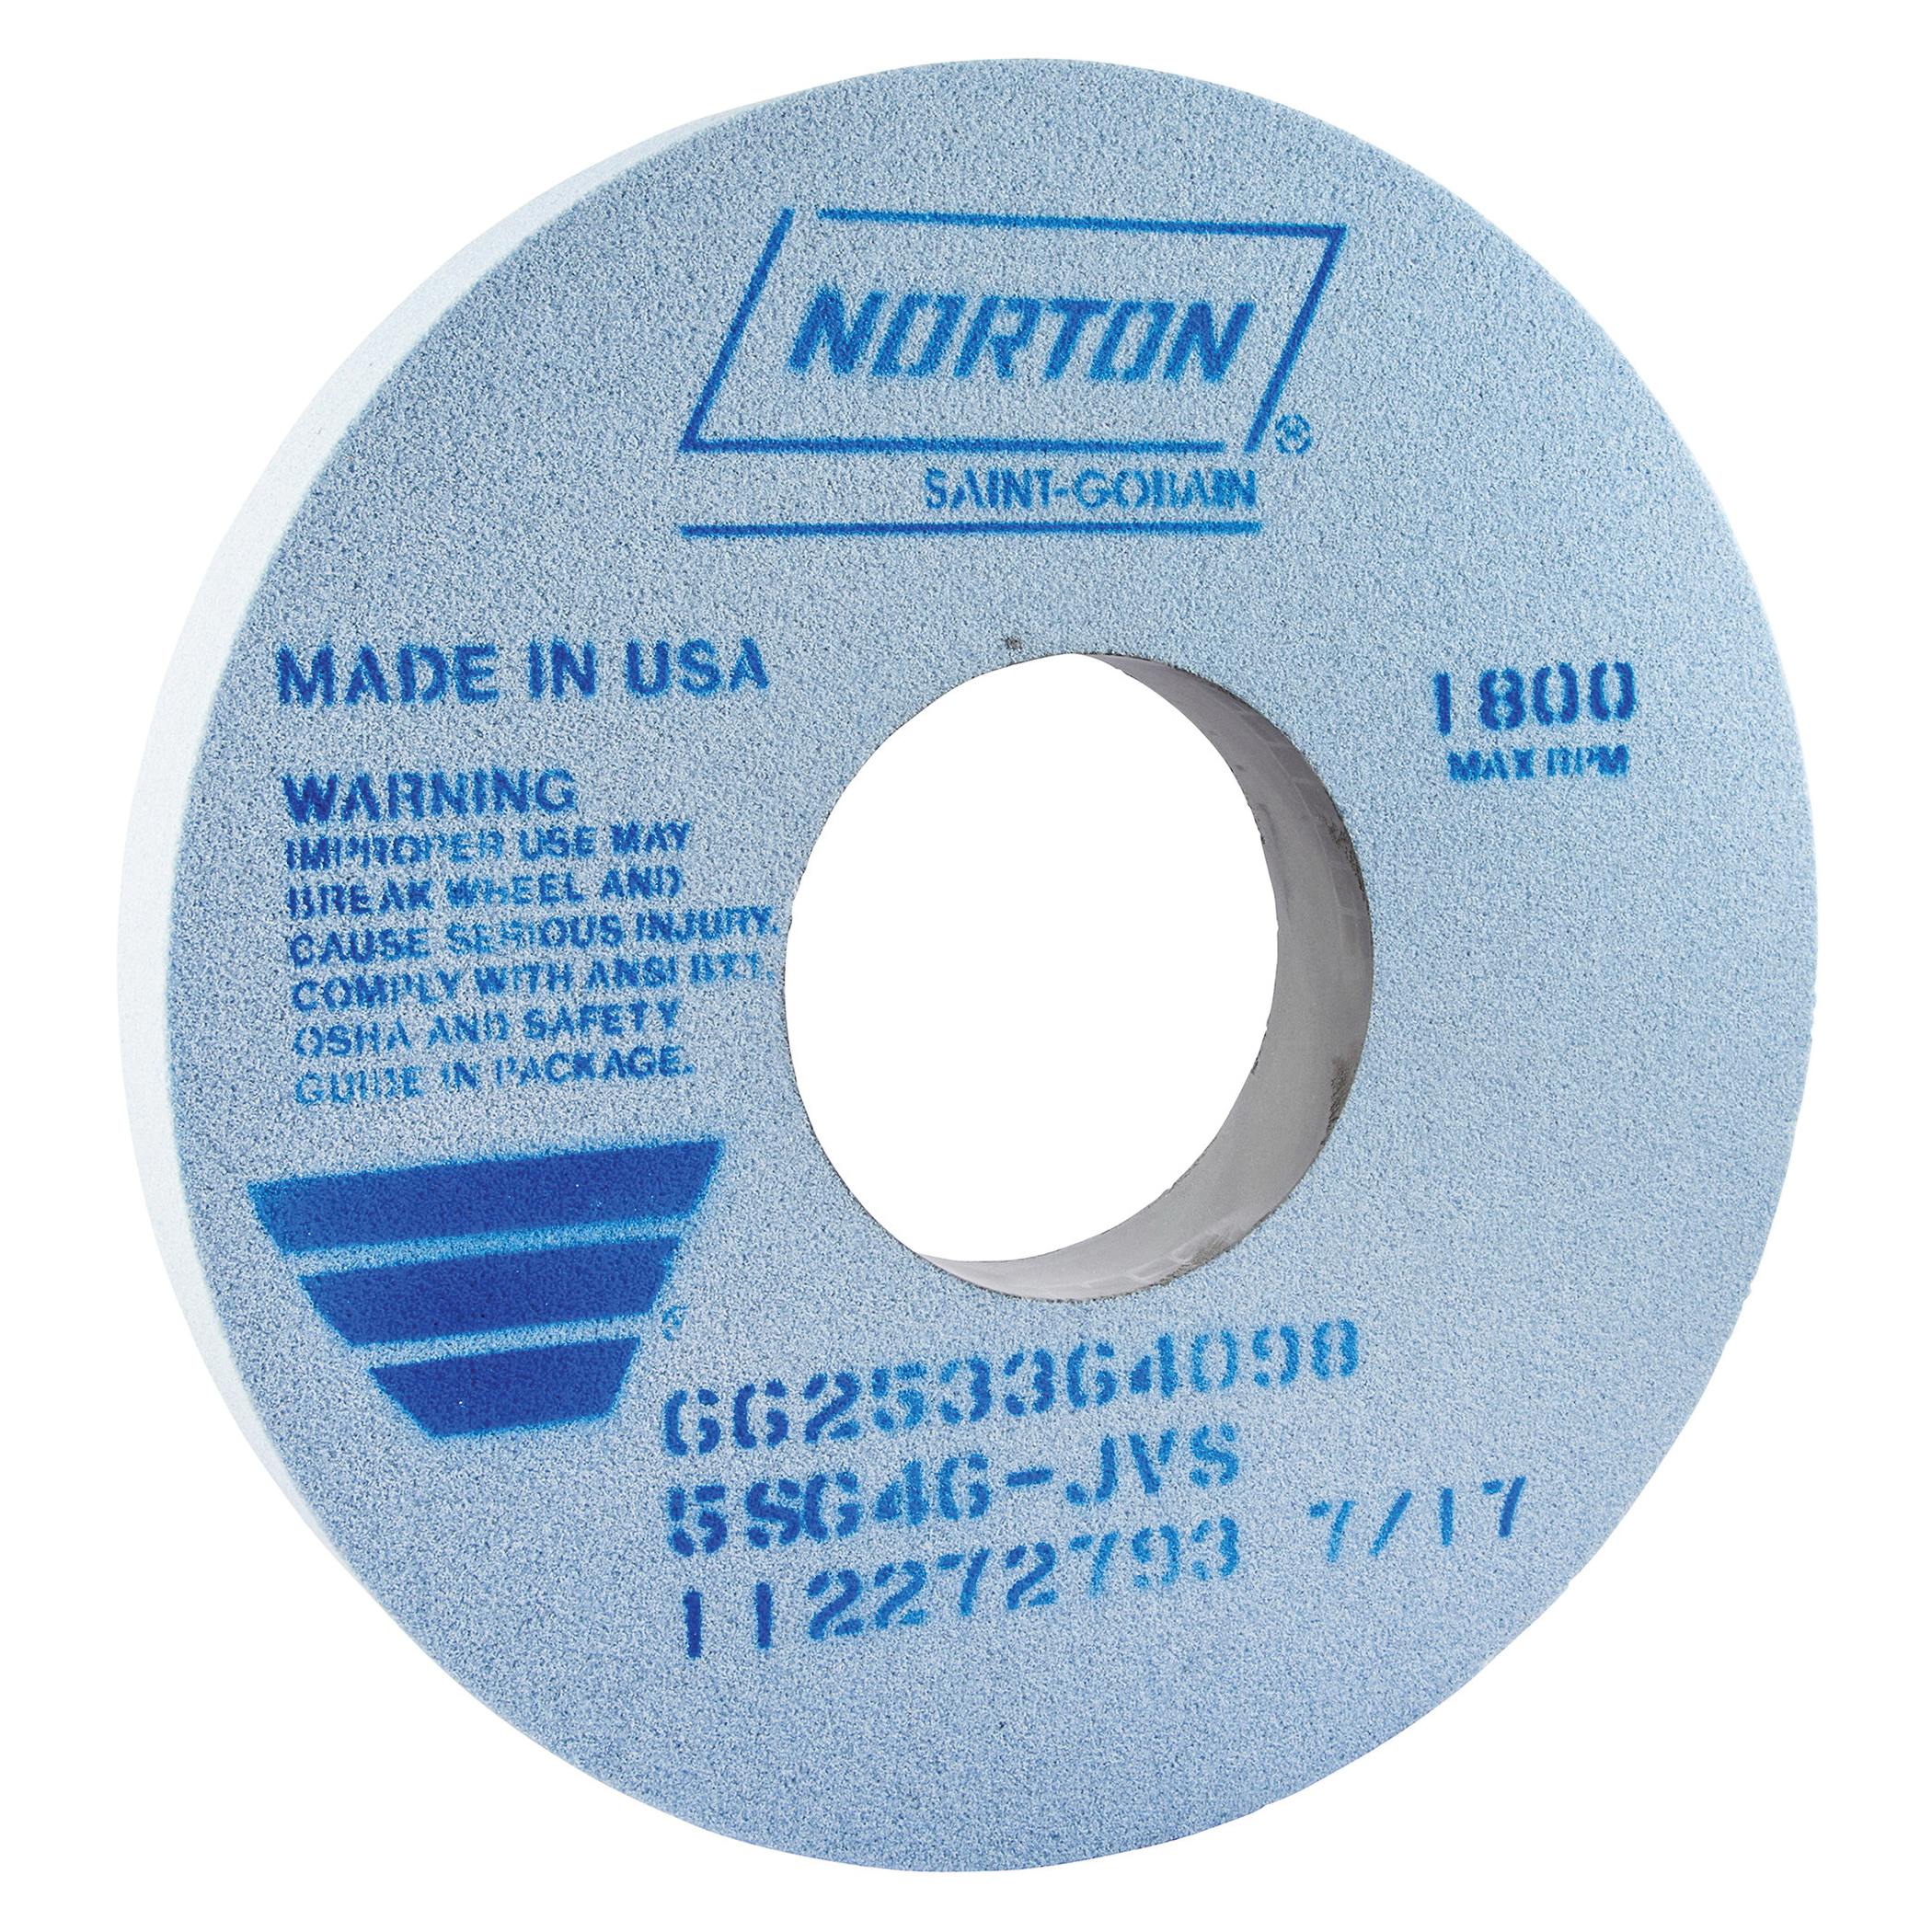 Norton® 66253363815 5SG Straight Toolroom Wheel, 14 in Dia x 1-1/2 in THK, 5 in Center Hole, 80 Grit, Ceramic Alumina/Friable Aluminum Oxide Abrasive